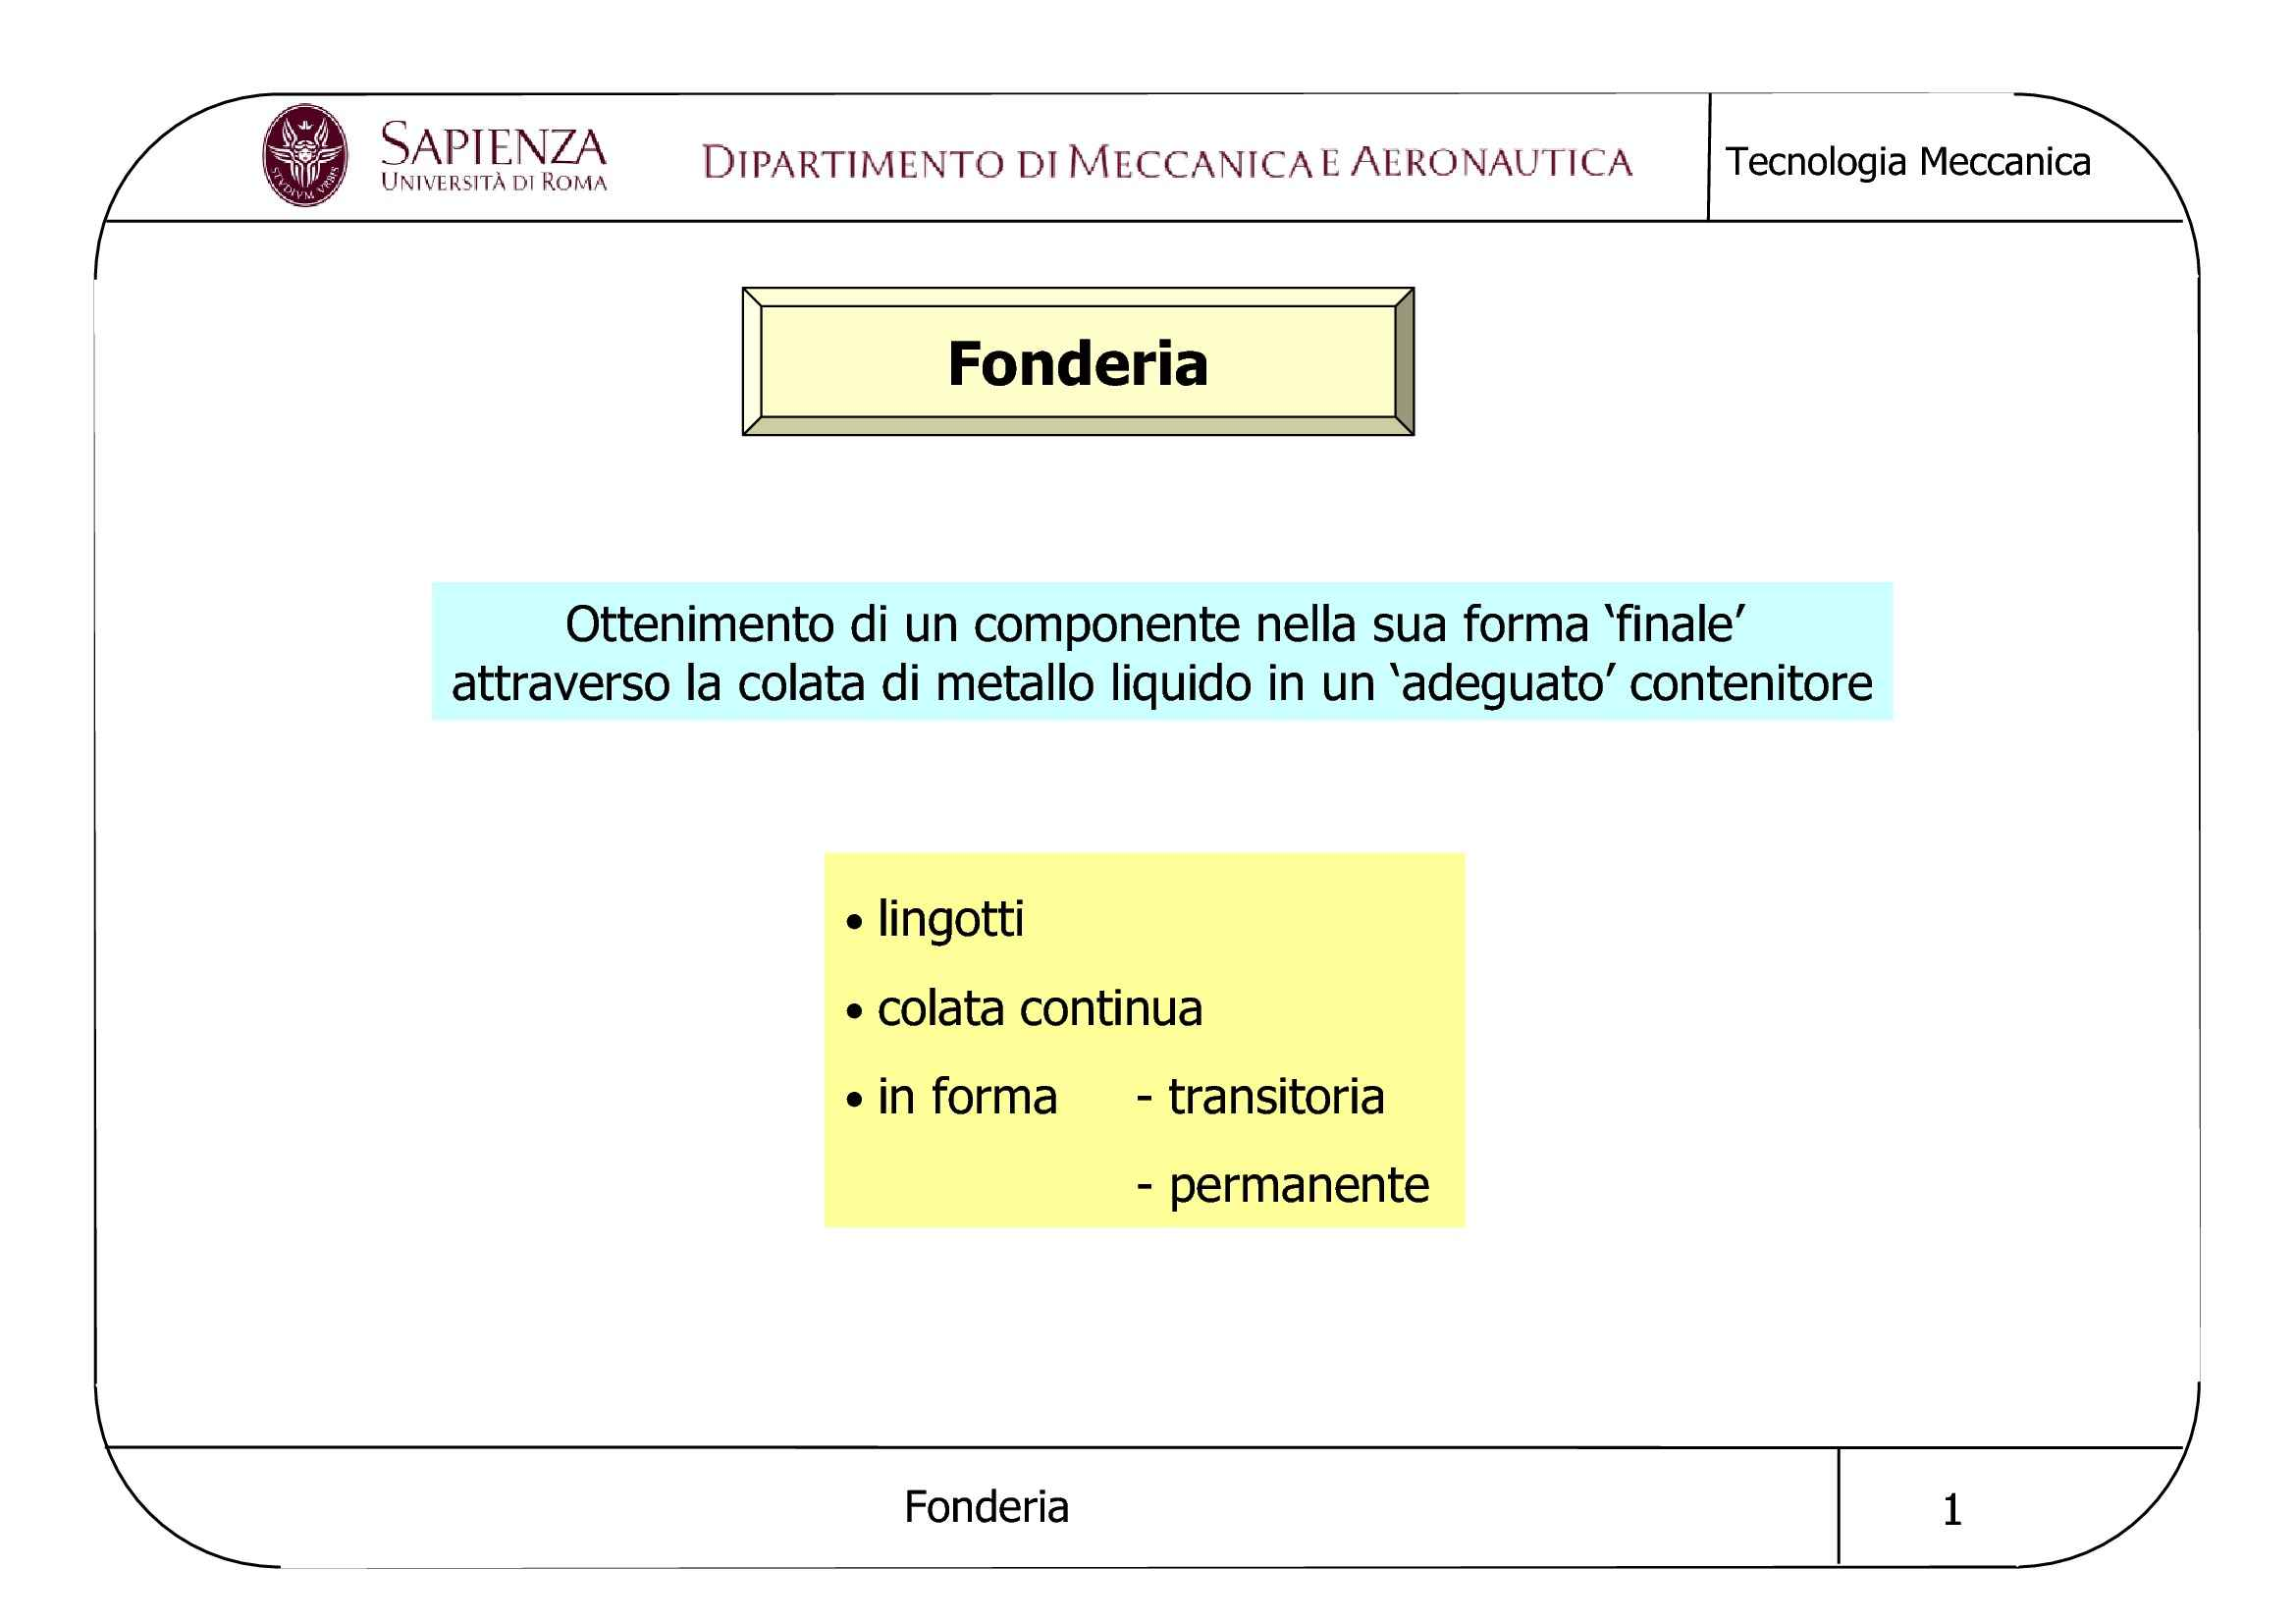 Fonderia